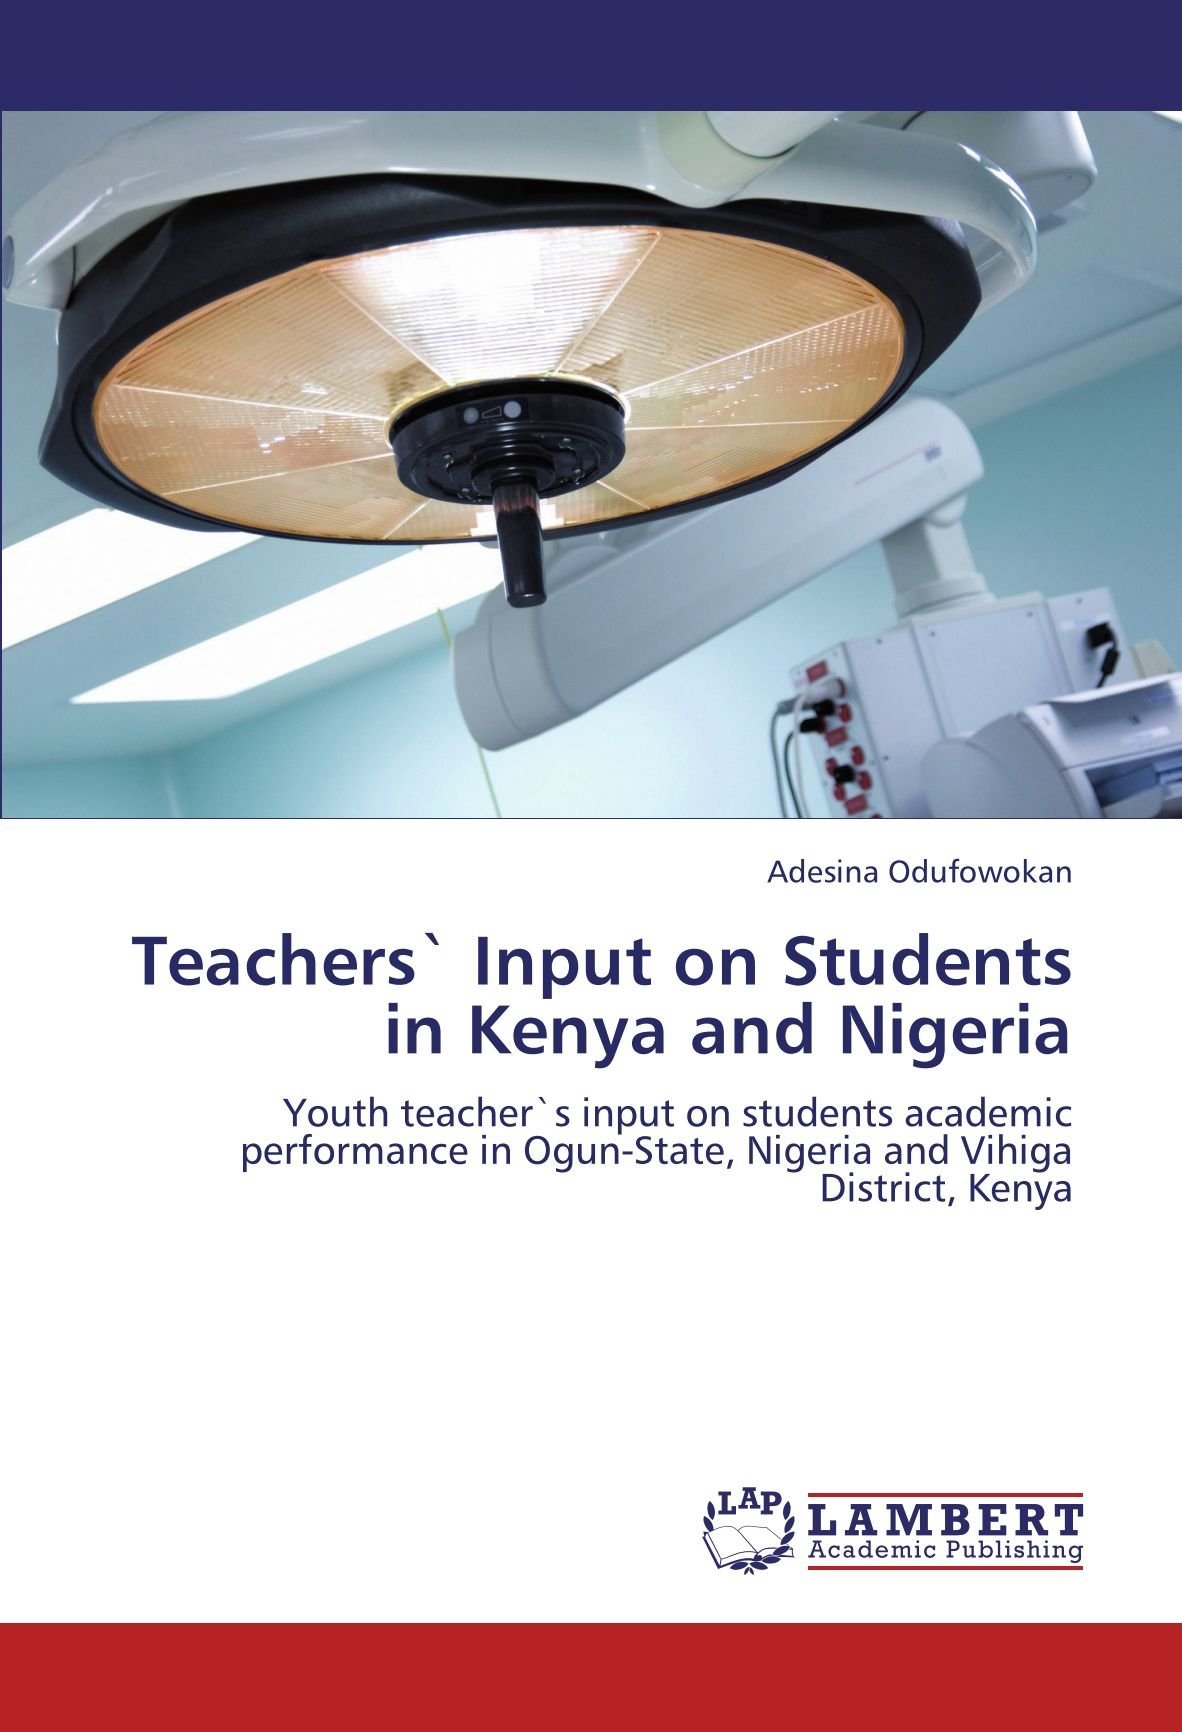 Teachers` Input on Students in Kenya and Nigeria: Youth teacher`s input on students academic performance in Ogun-State, Nigeria and Vihiga District, Kenya ebook